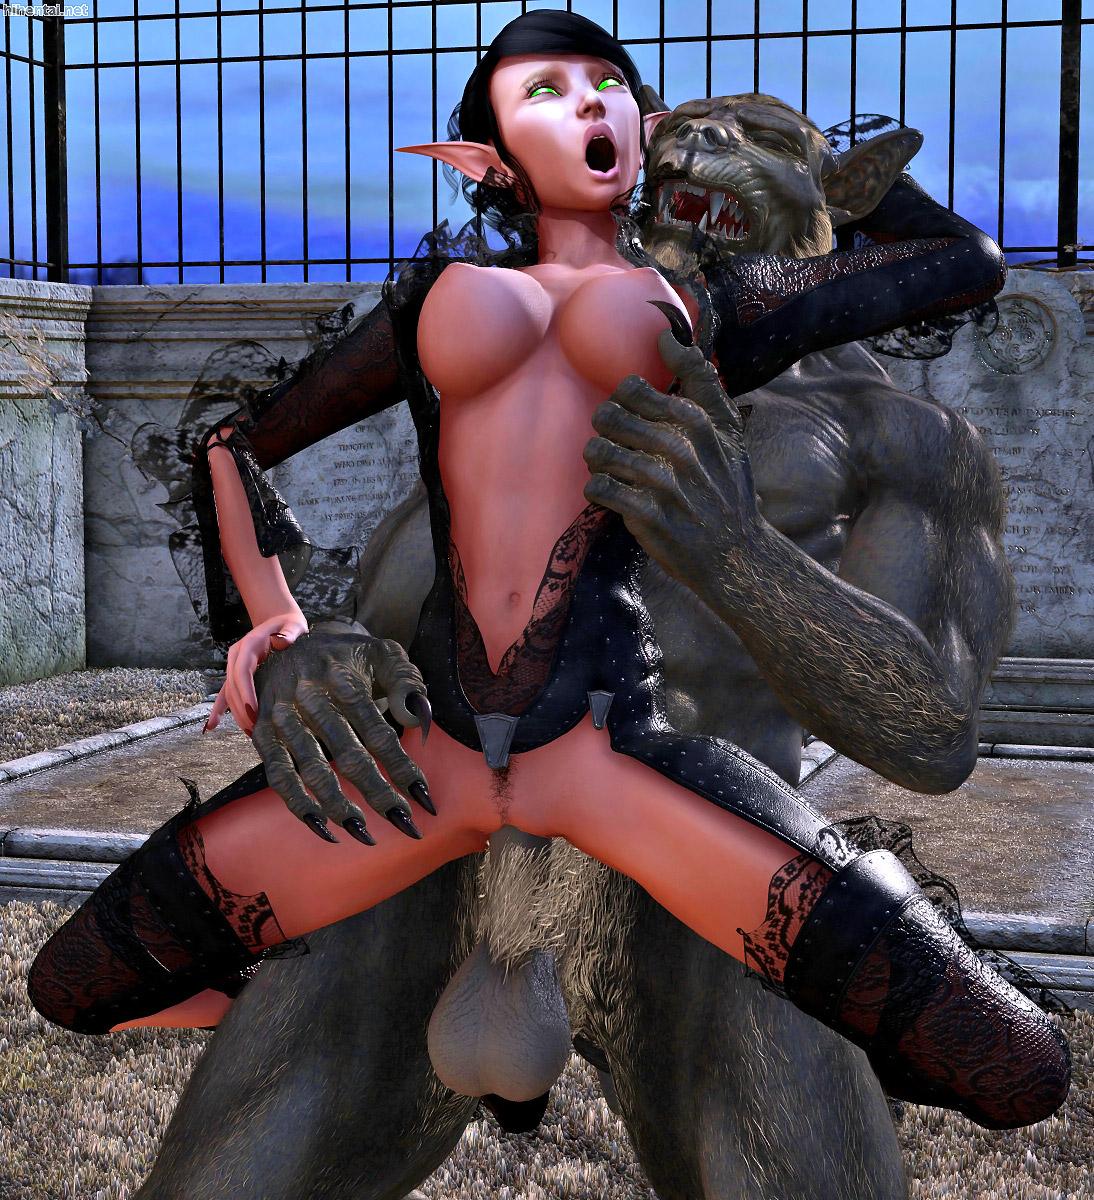 Alien fucks girl porn clip